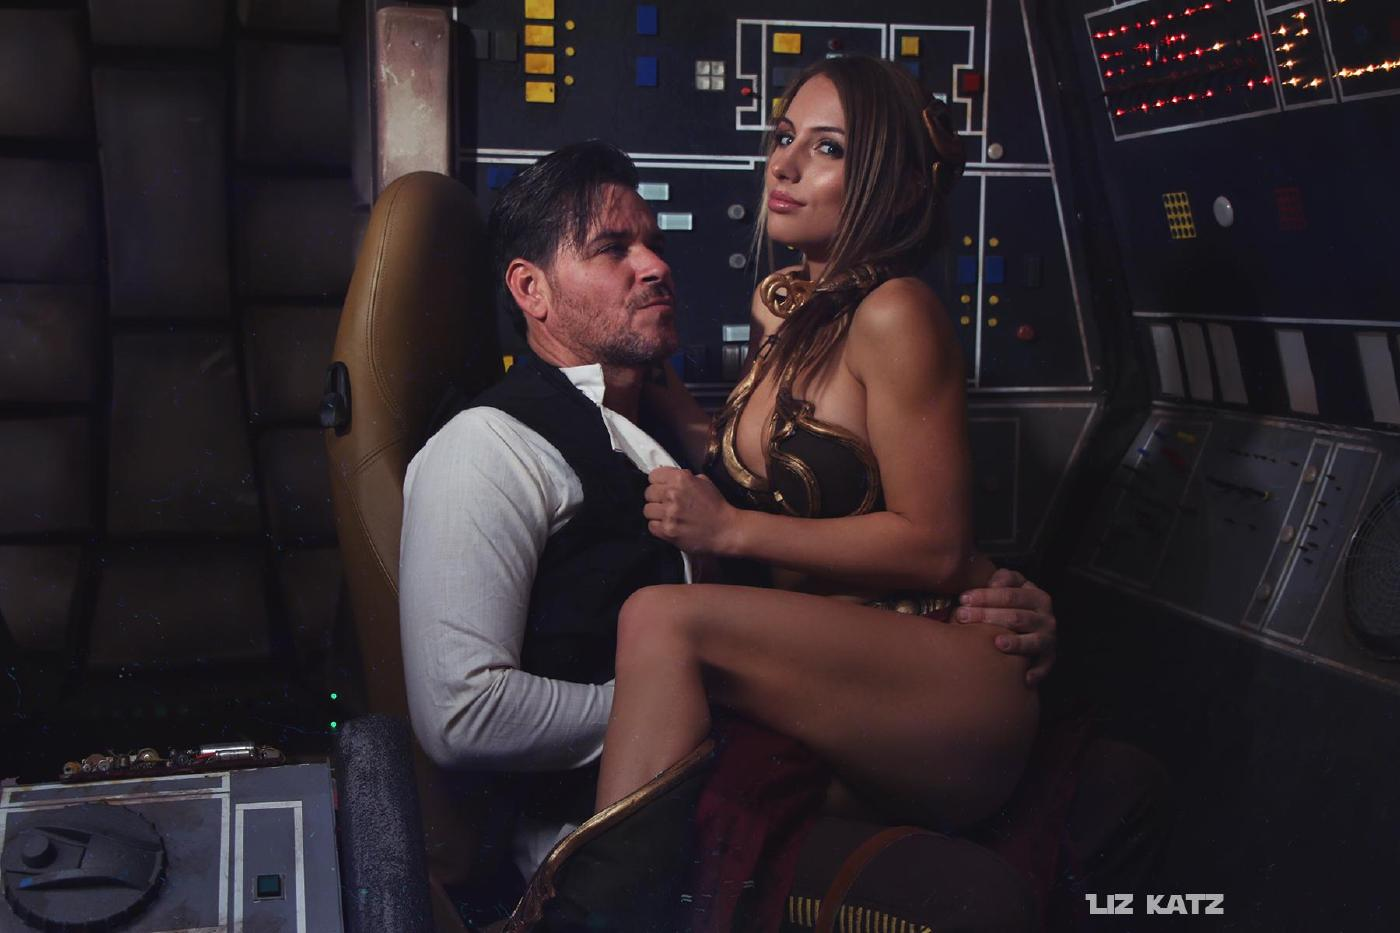 Liz Katz Slave Leia Nude Cosplay Onlyfans Leaked Photos 22